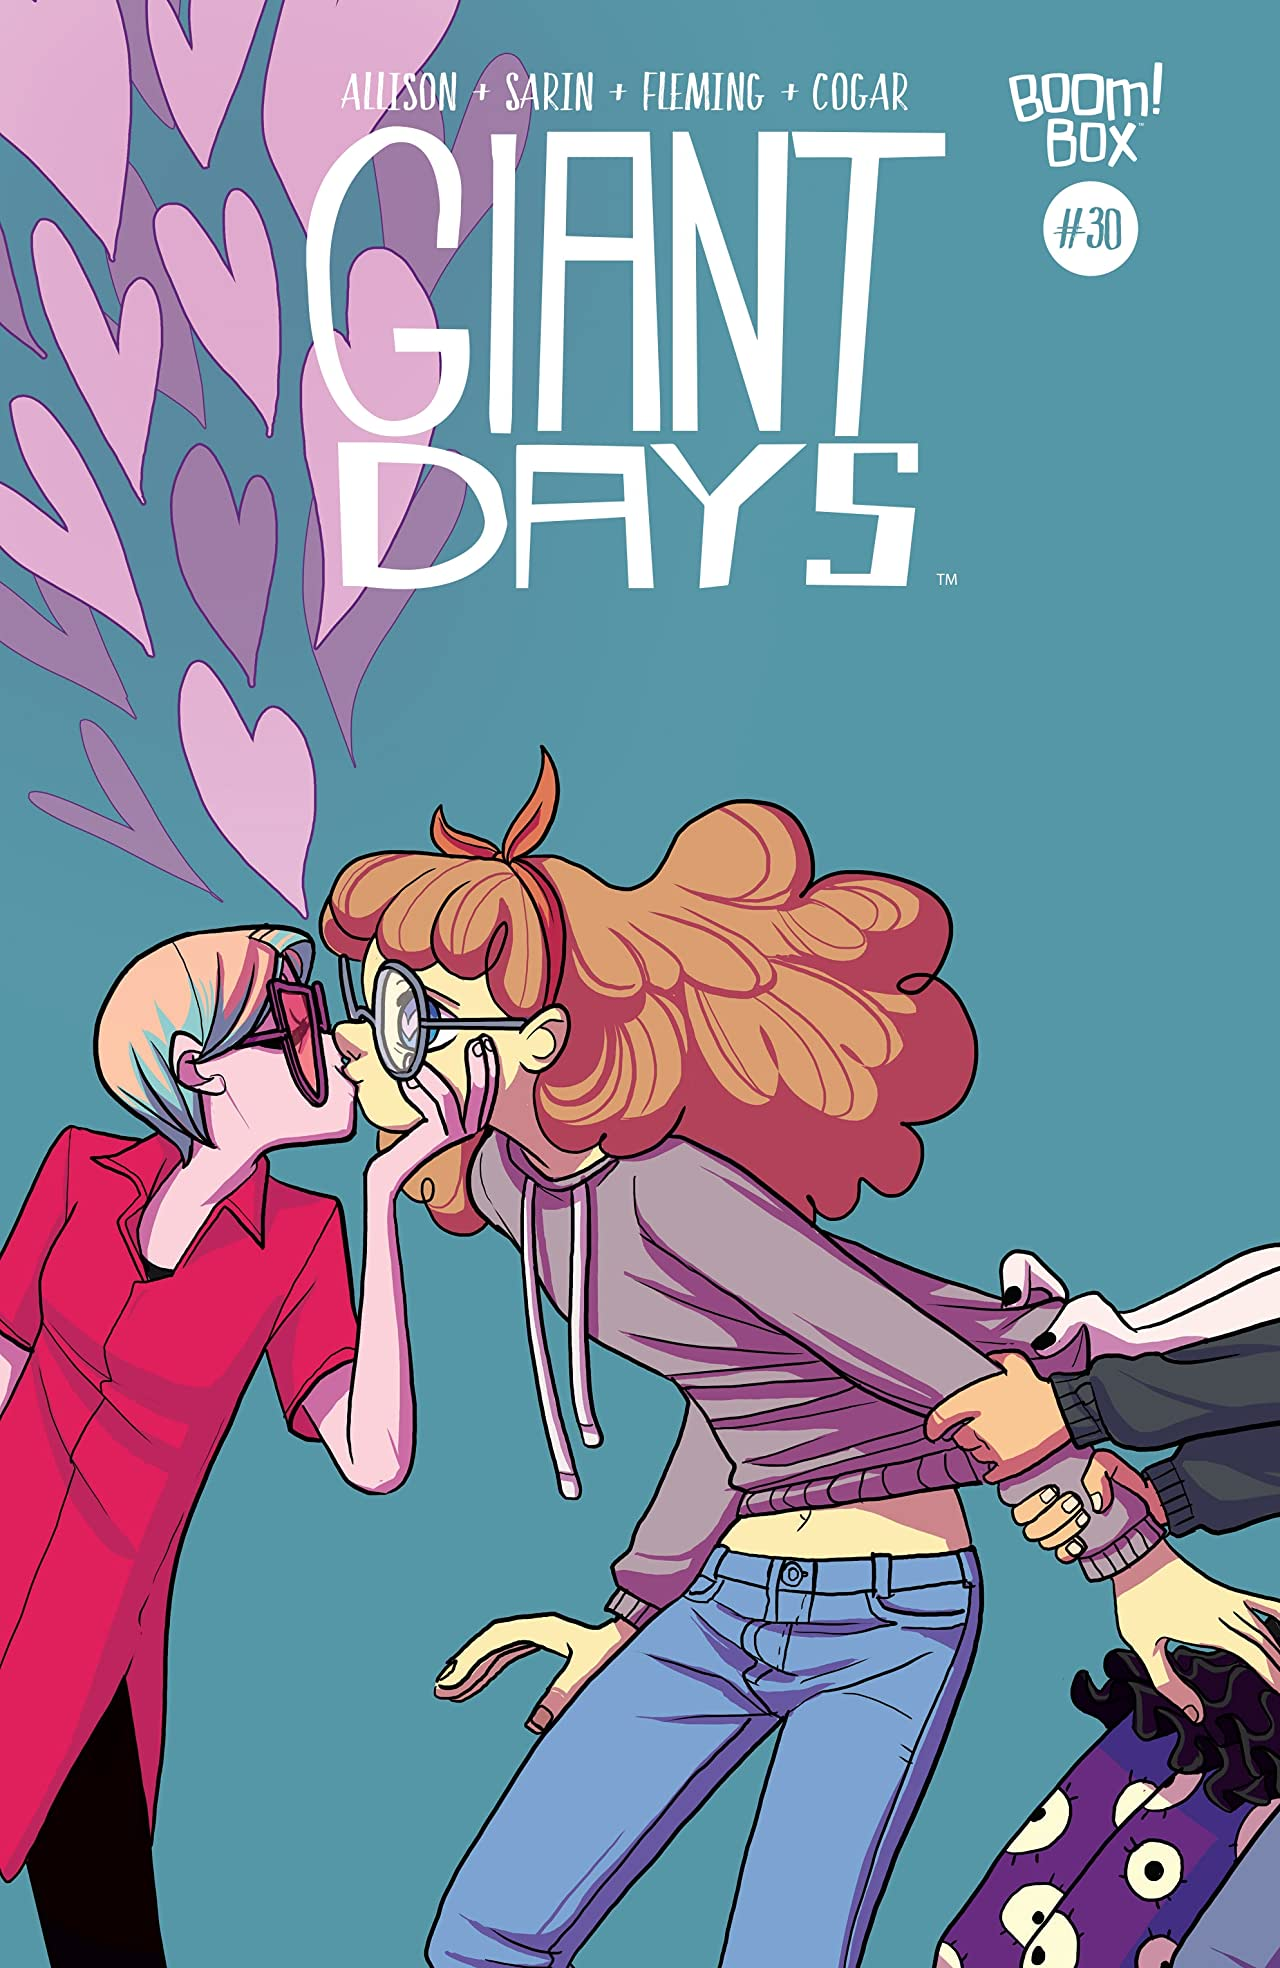 Giant Days #30